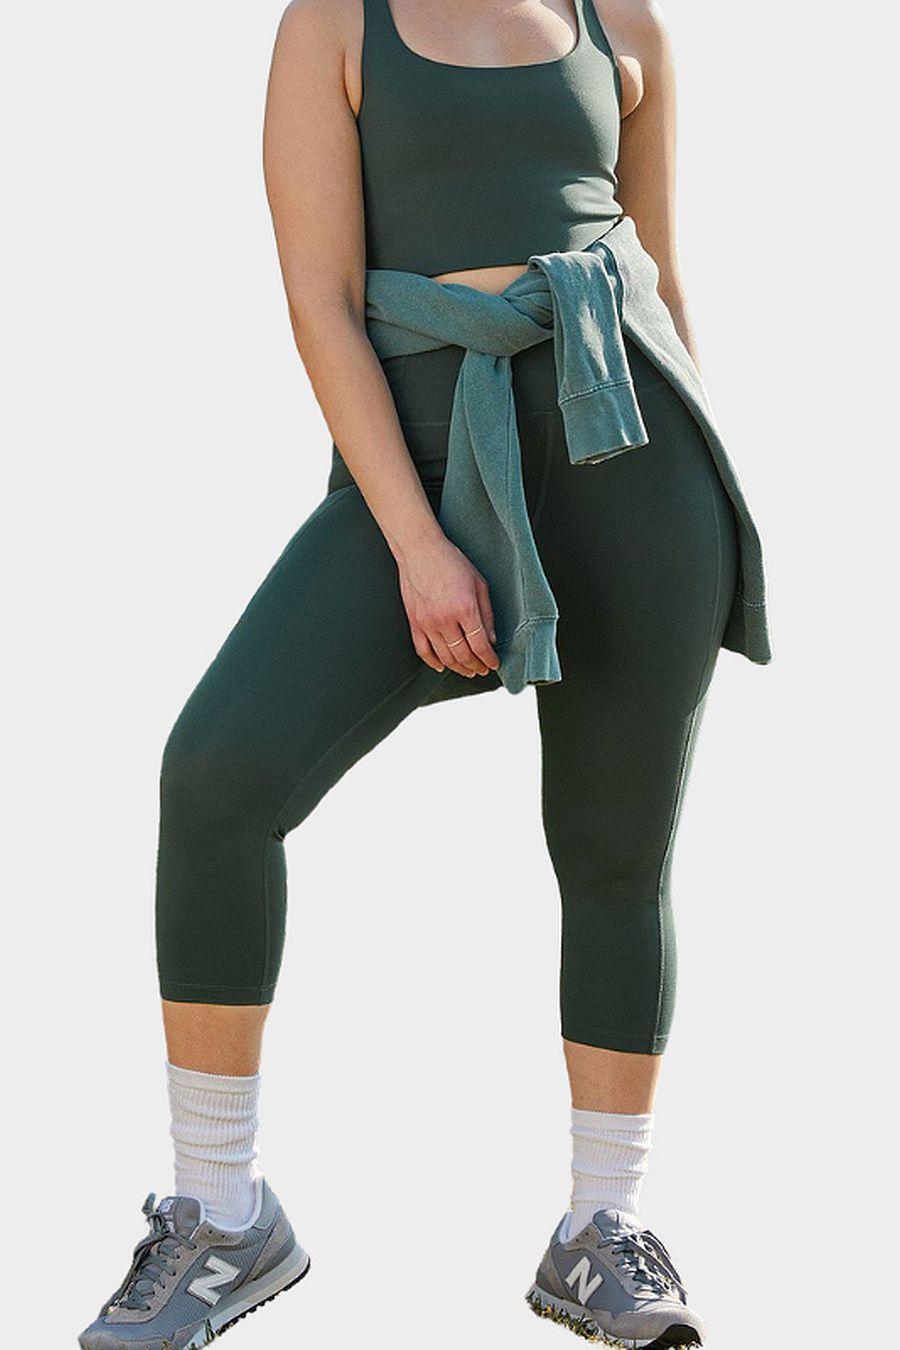 "Girlfriend Collective Moss Compressive Legging (19.5"")"